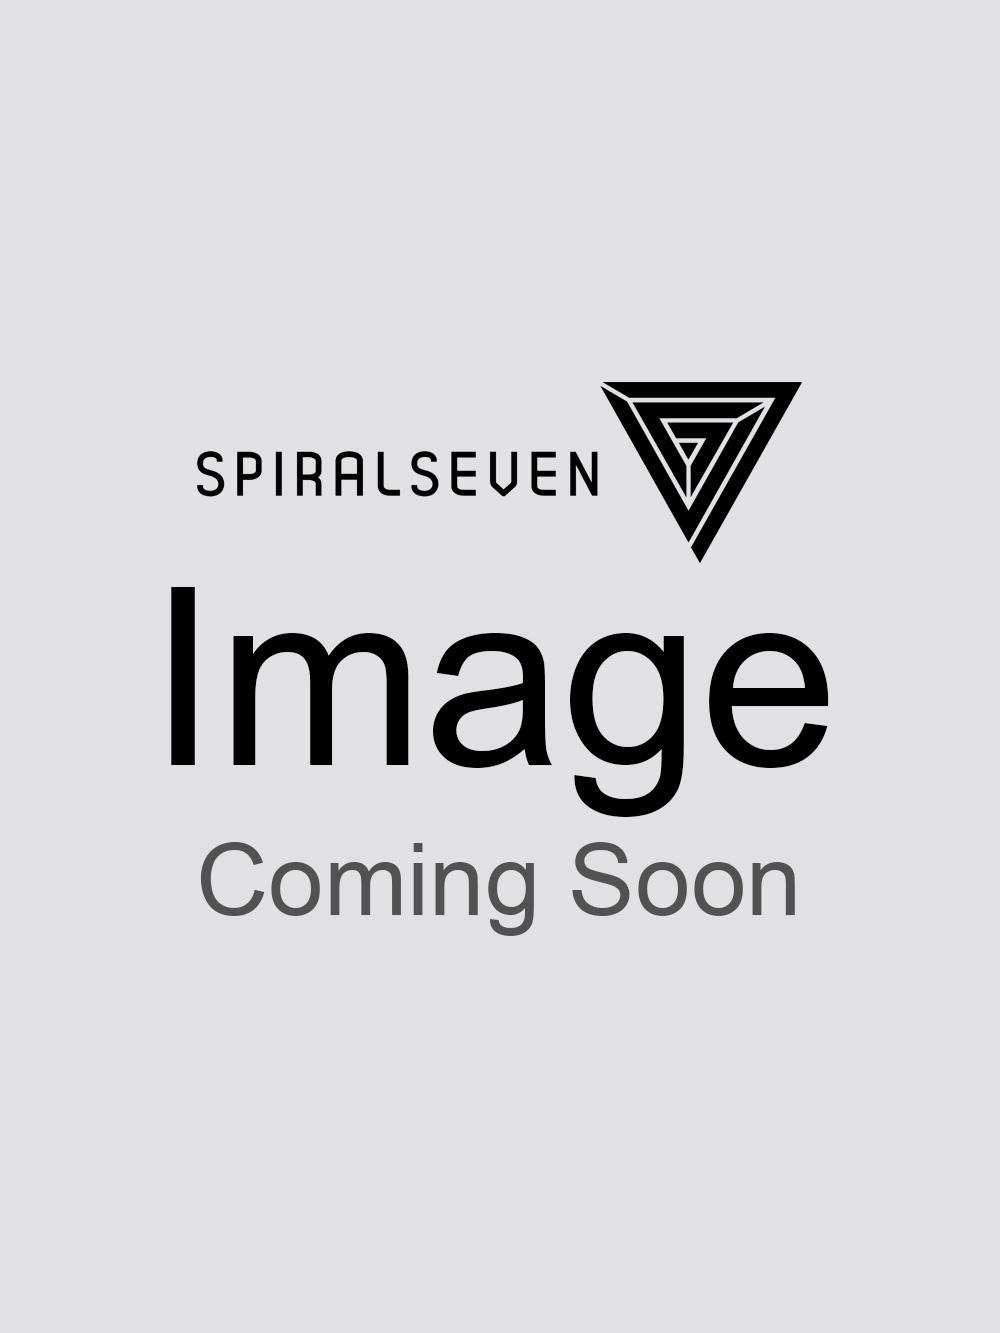 9466fc415604b Sergio Tacchini Time Shorts Navy | Spiral Seven - Designer Clothing